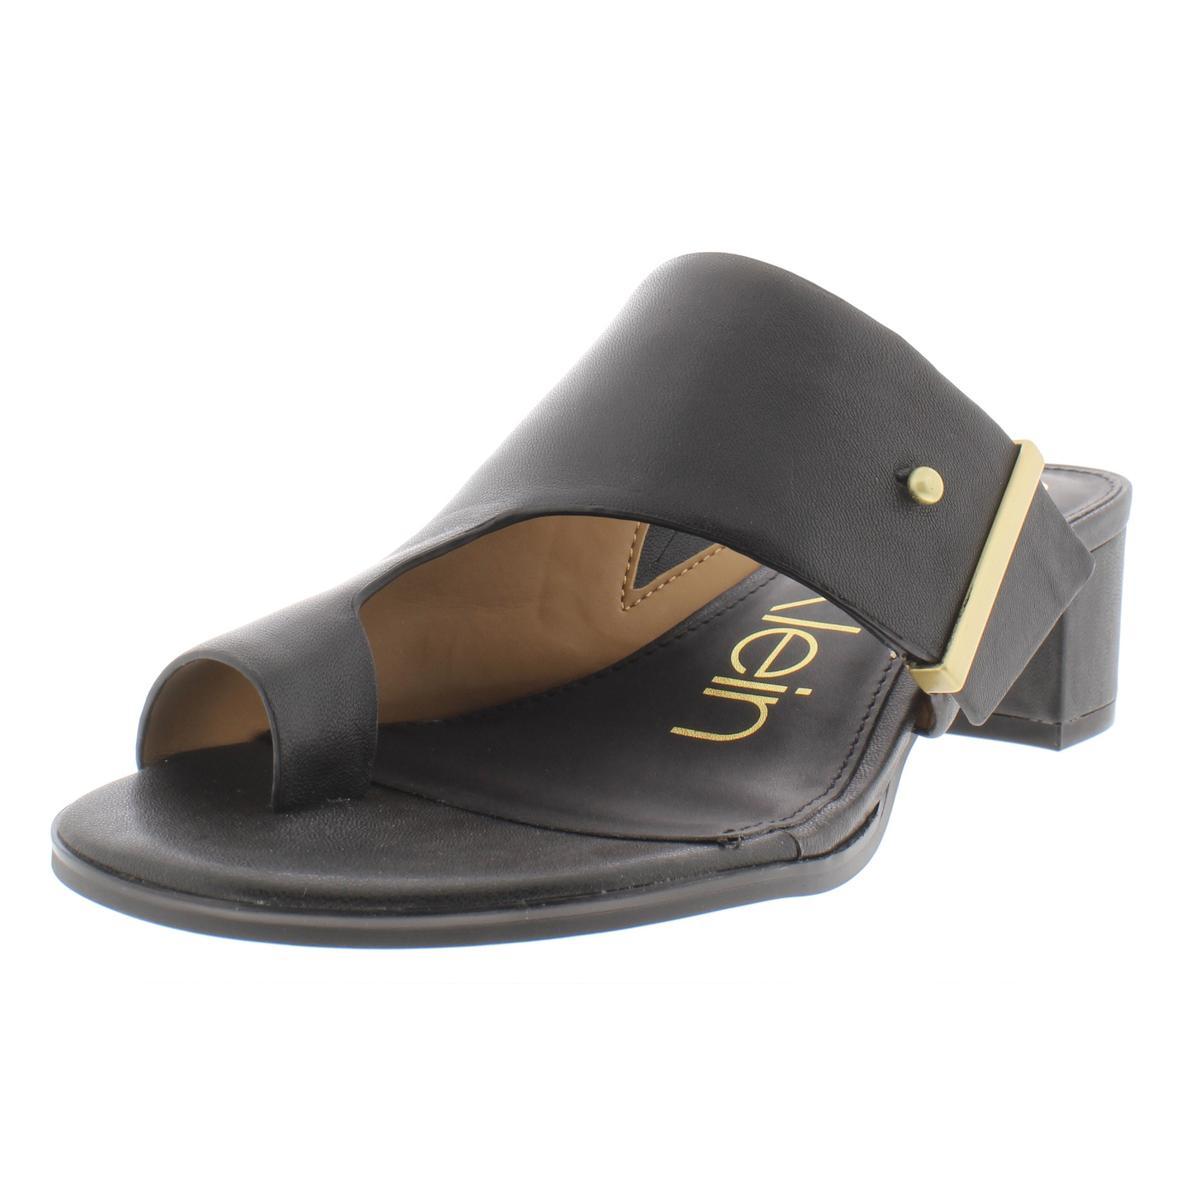 8be27f7332 Calvin Klein Womens Daria Leather Block Heel Dress Sandals Shoes ...